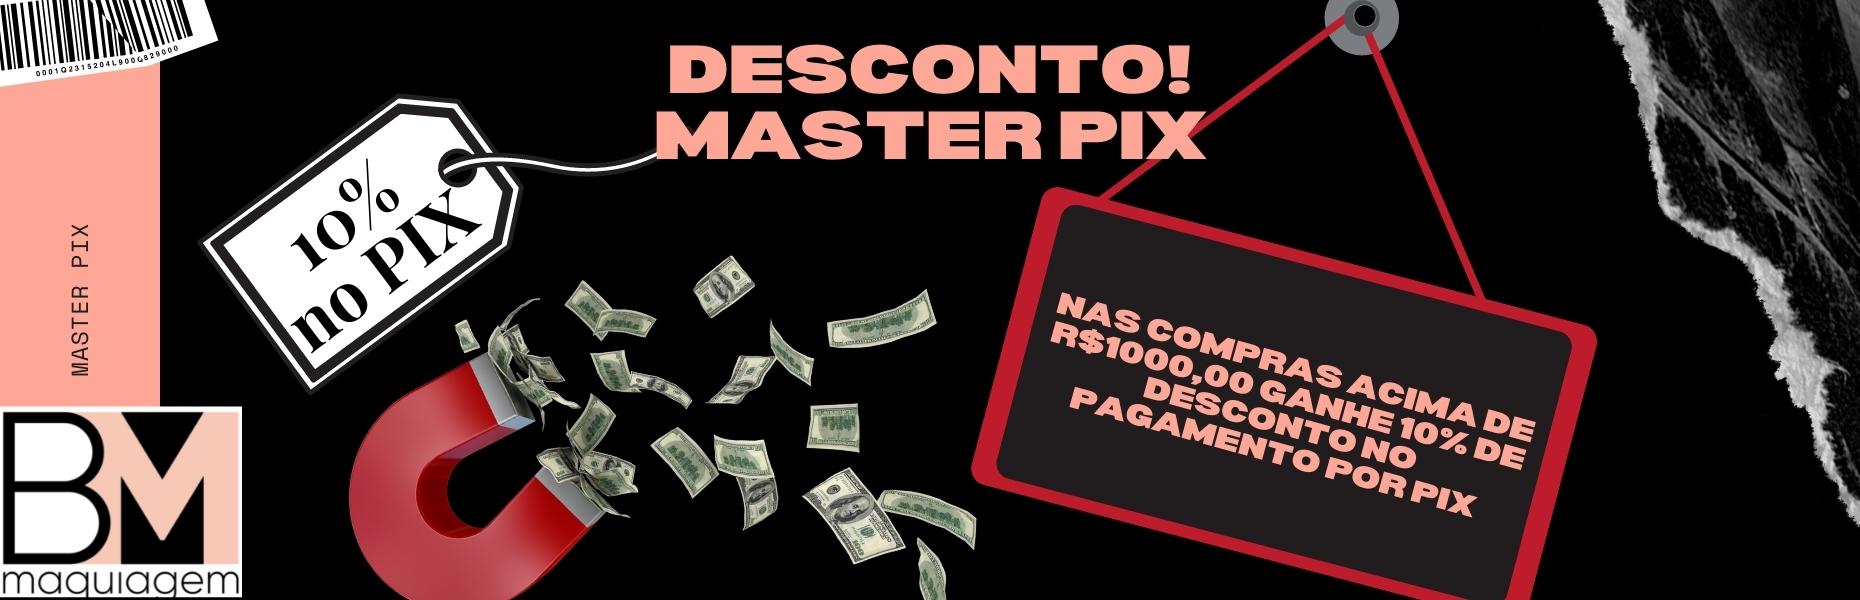 Master Pix